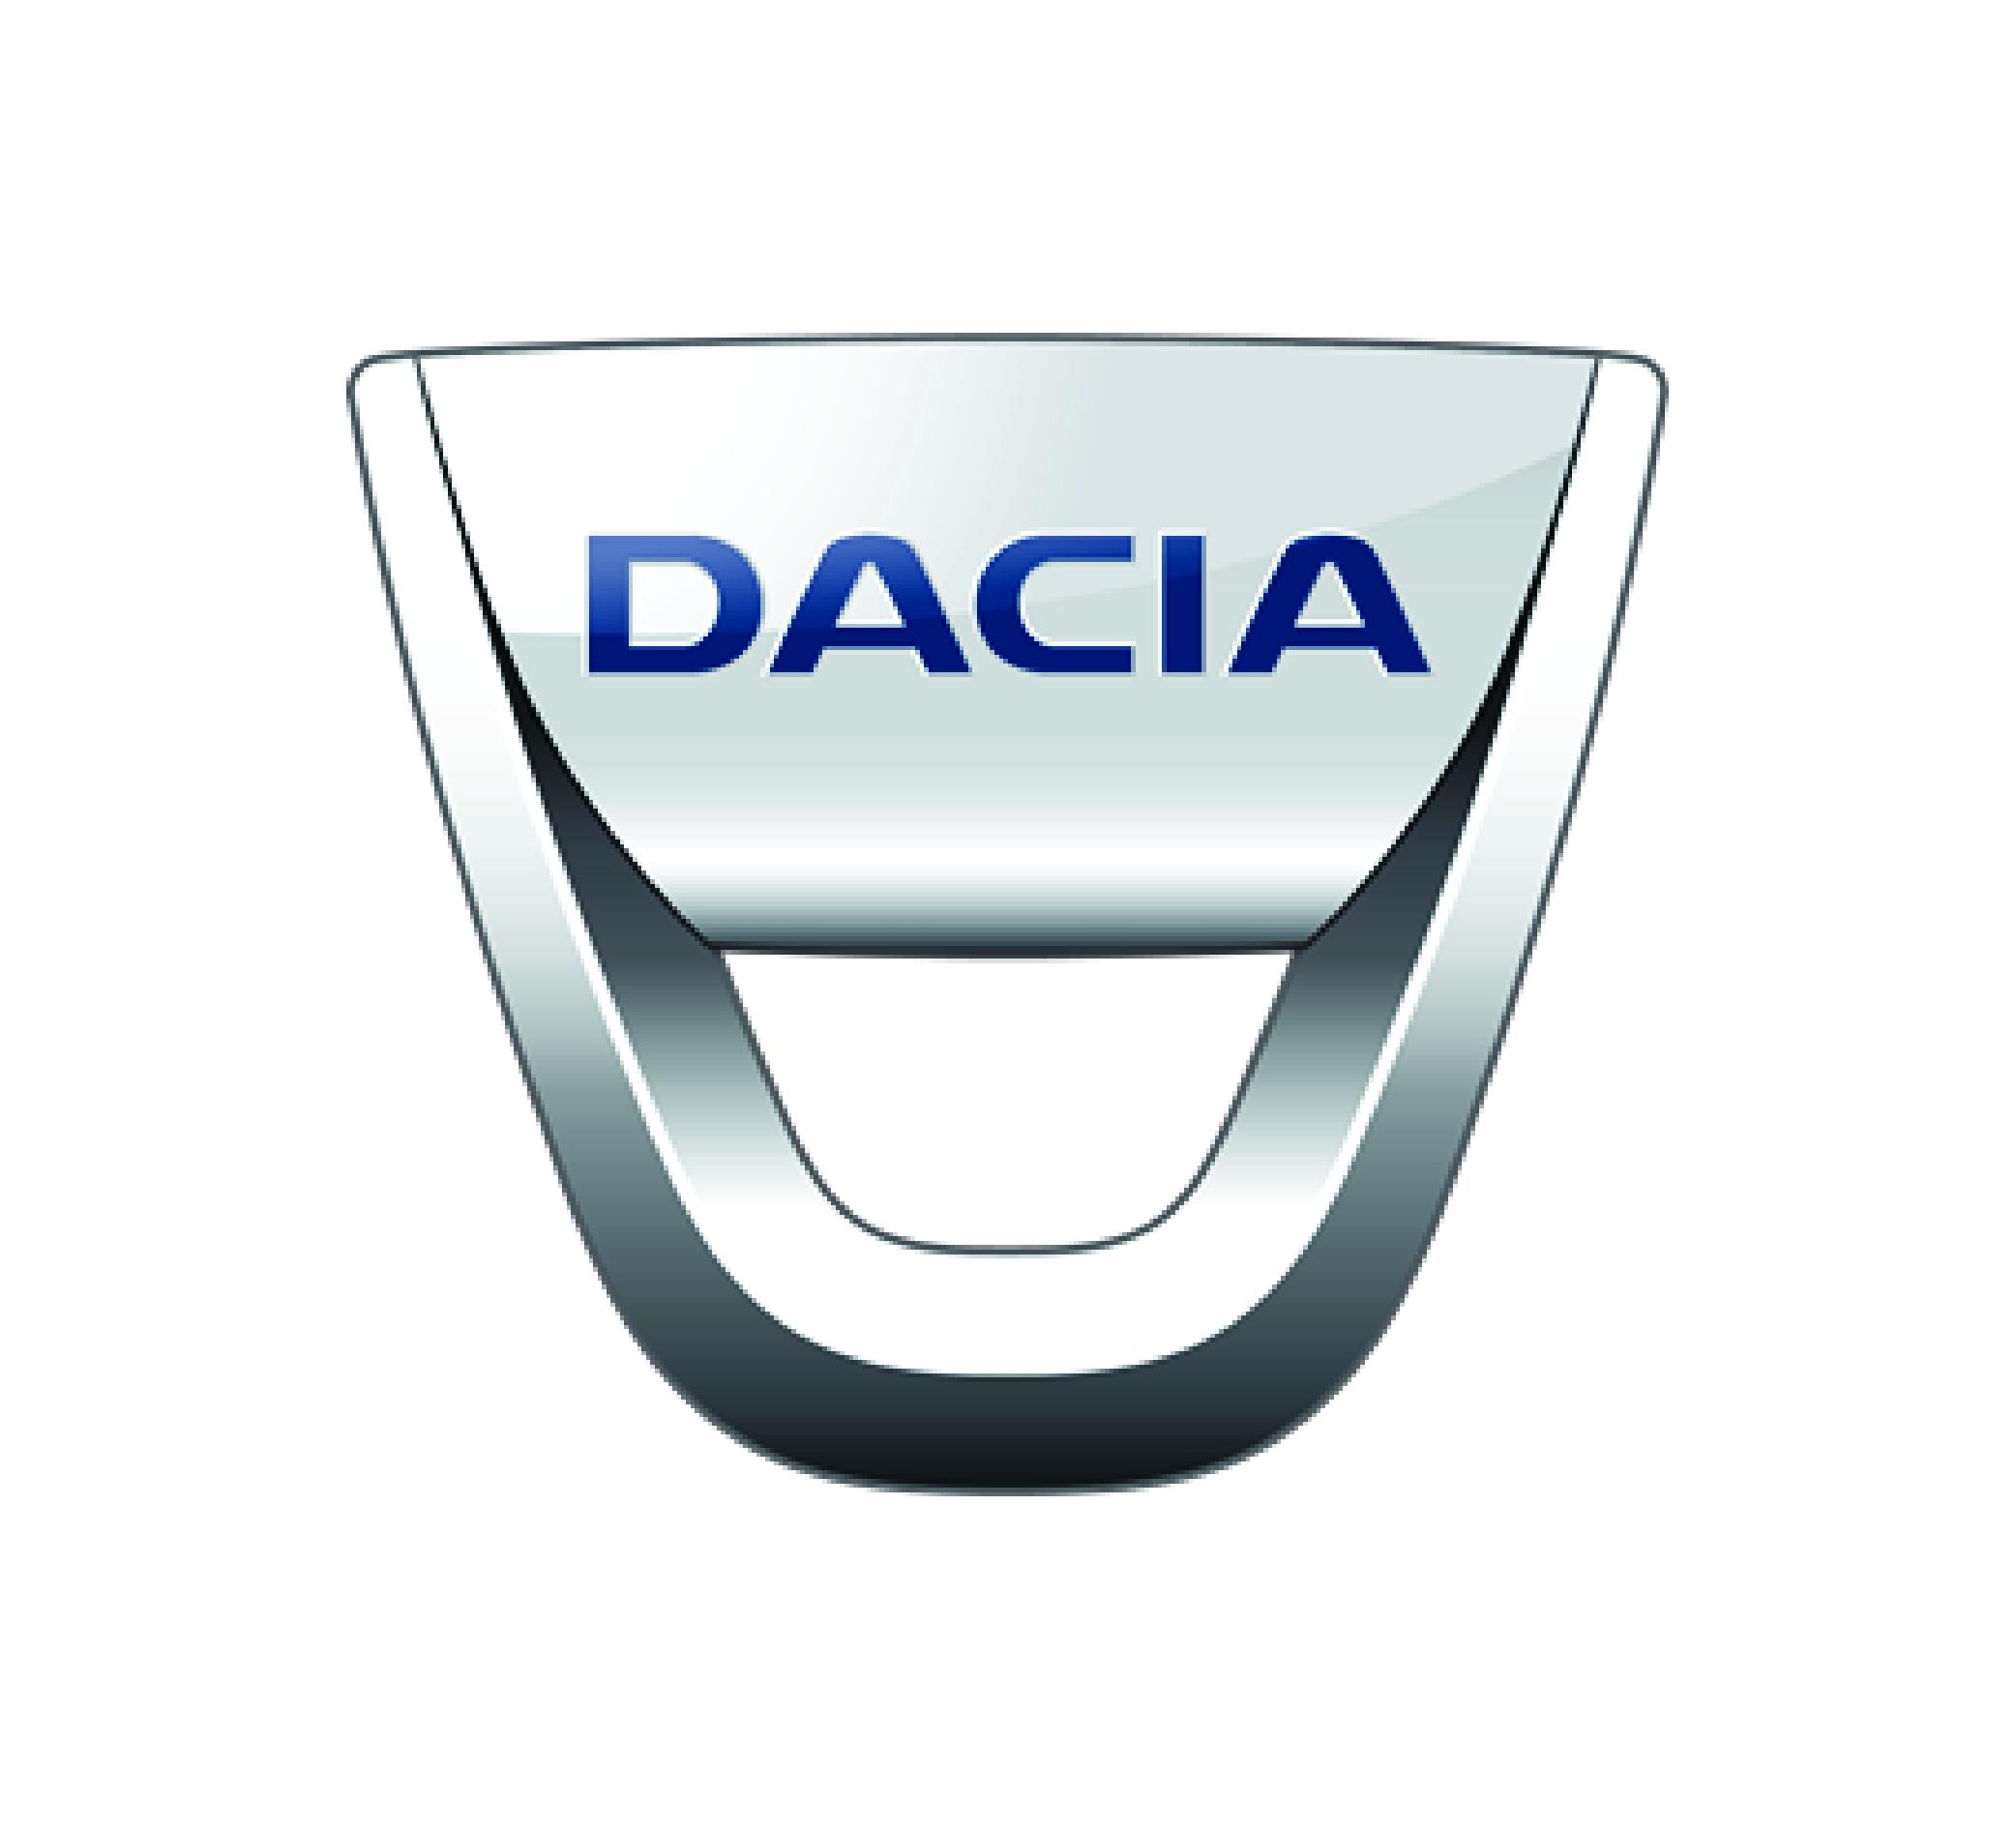 dacia-01